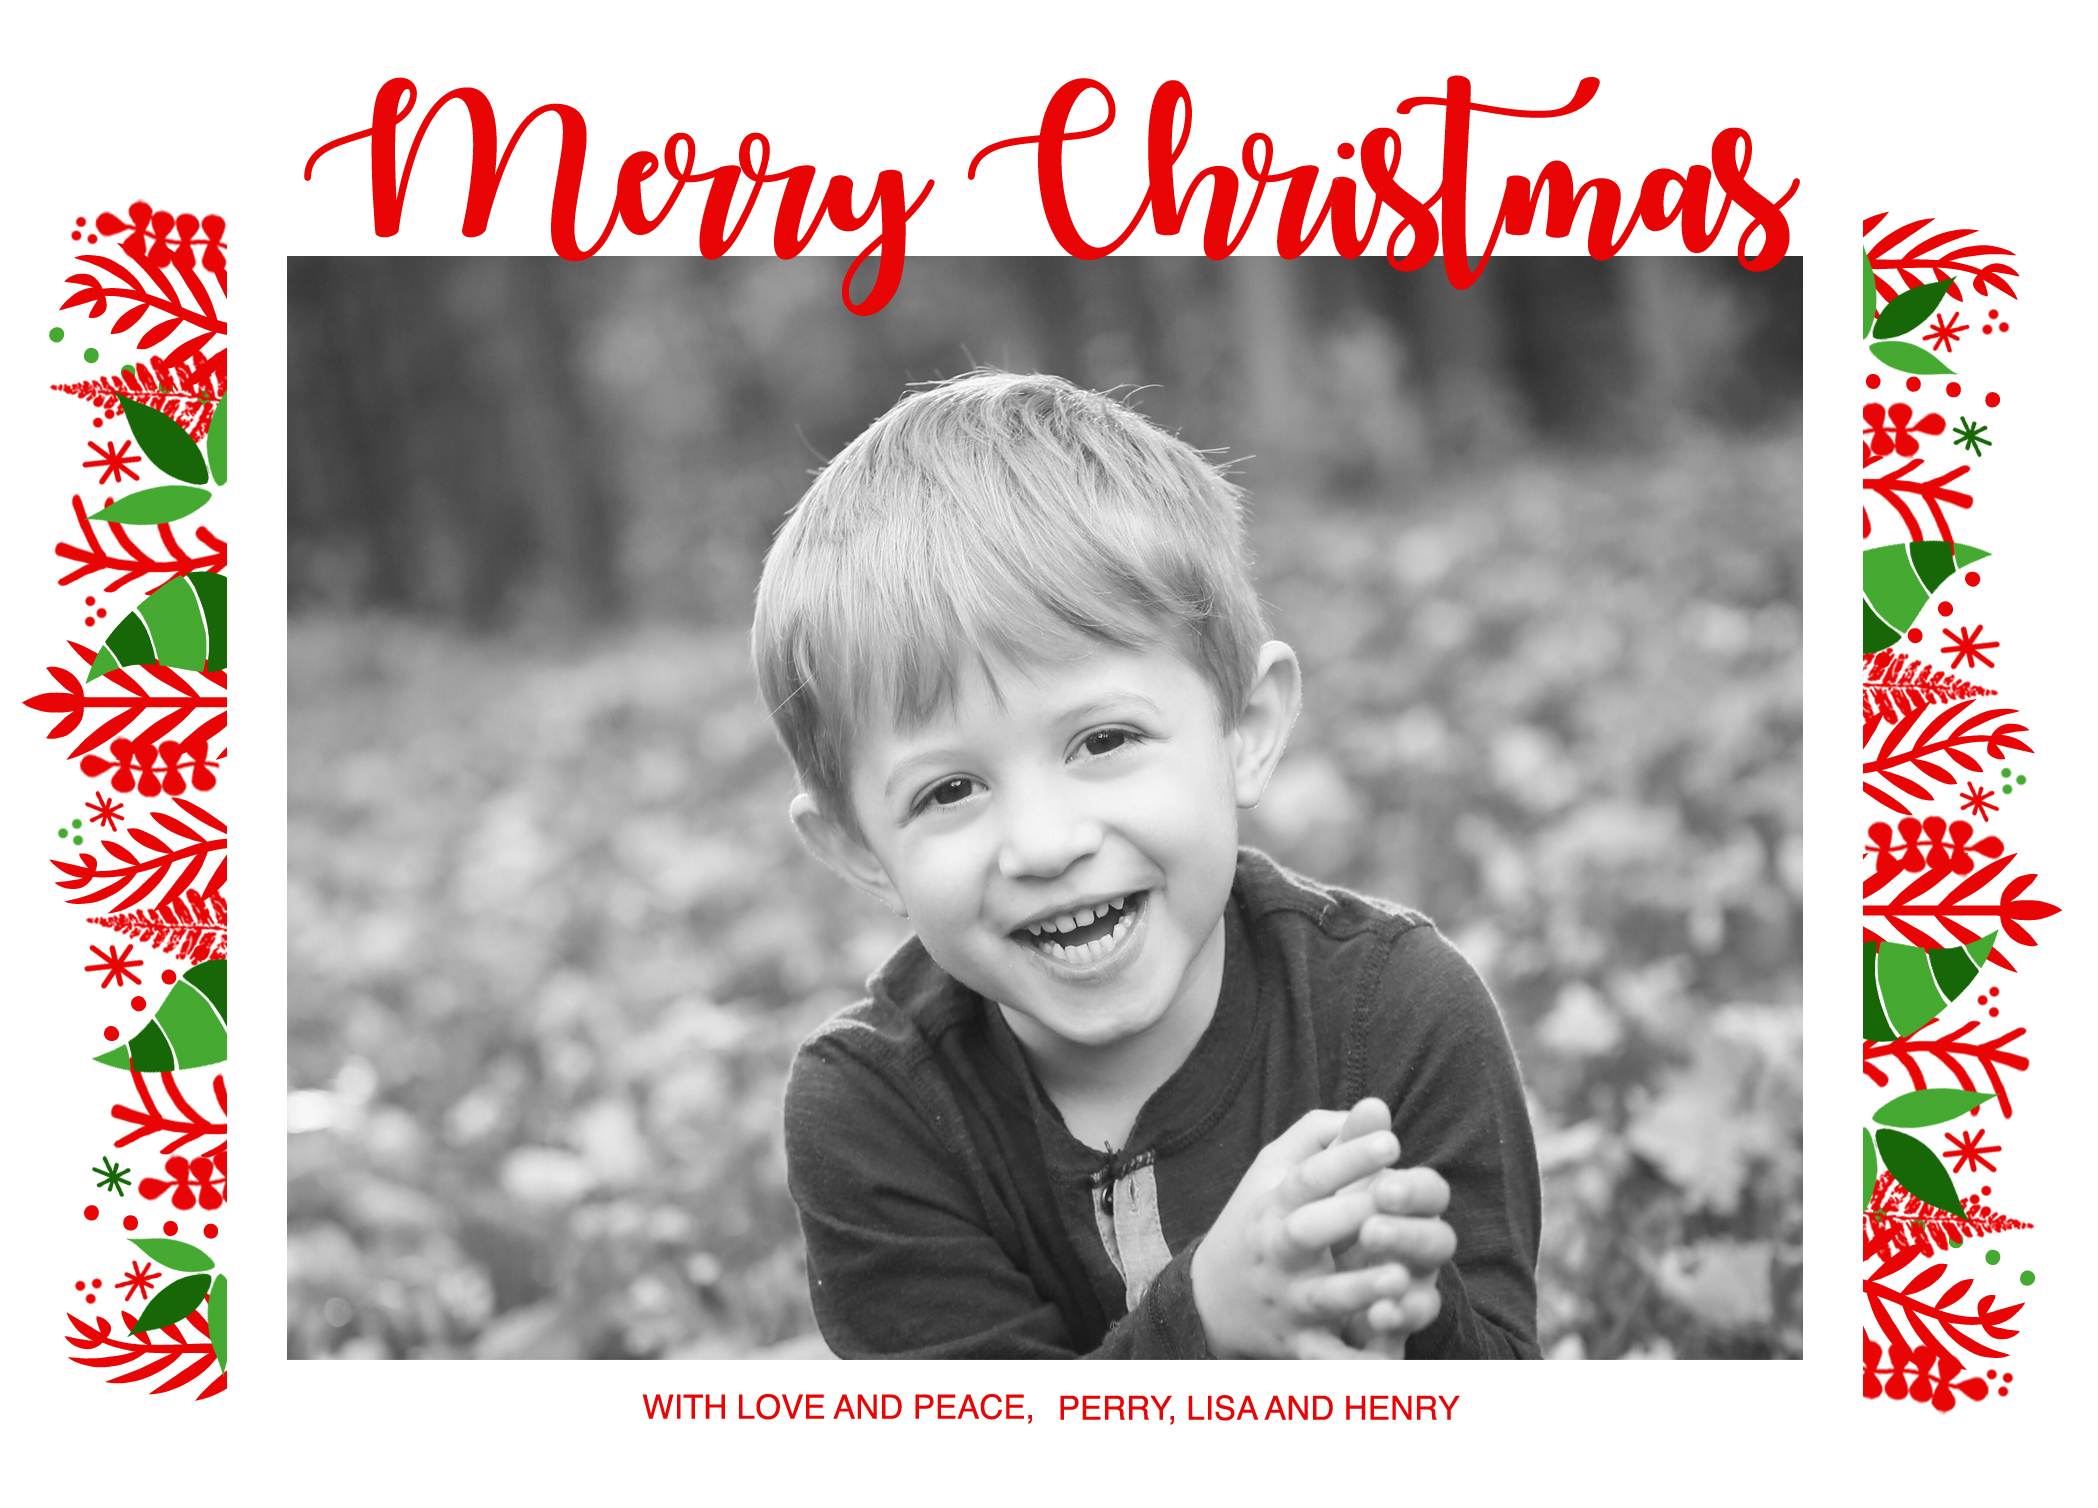 Cornicopia_Christmas.jpg